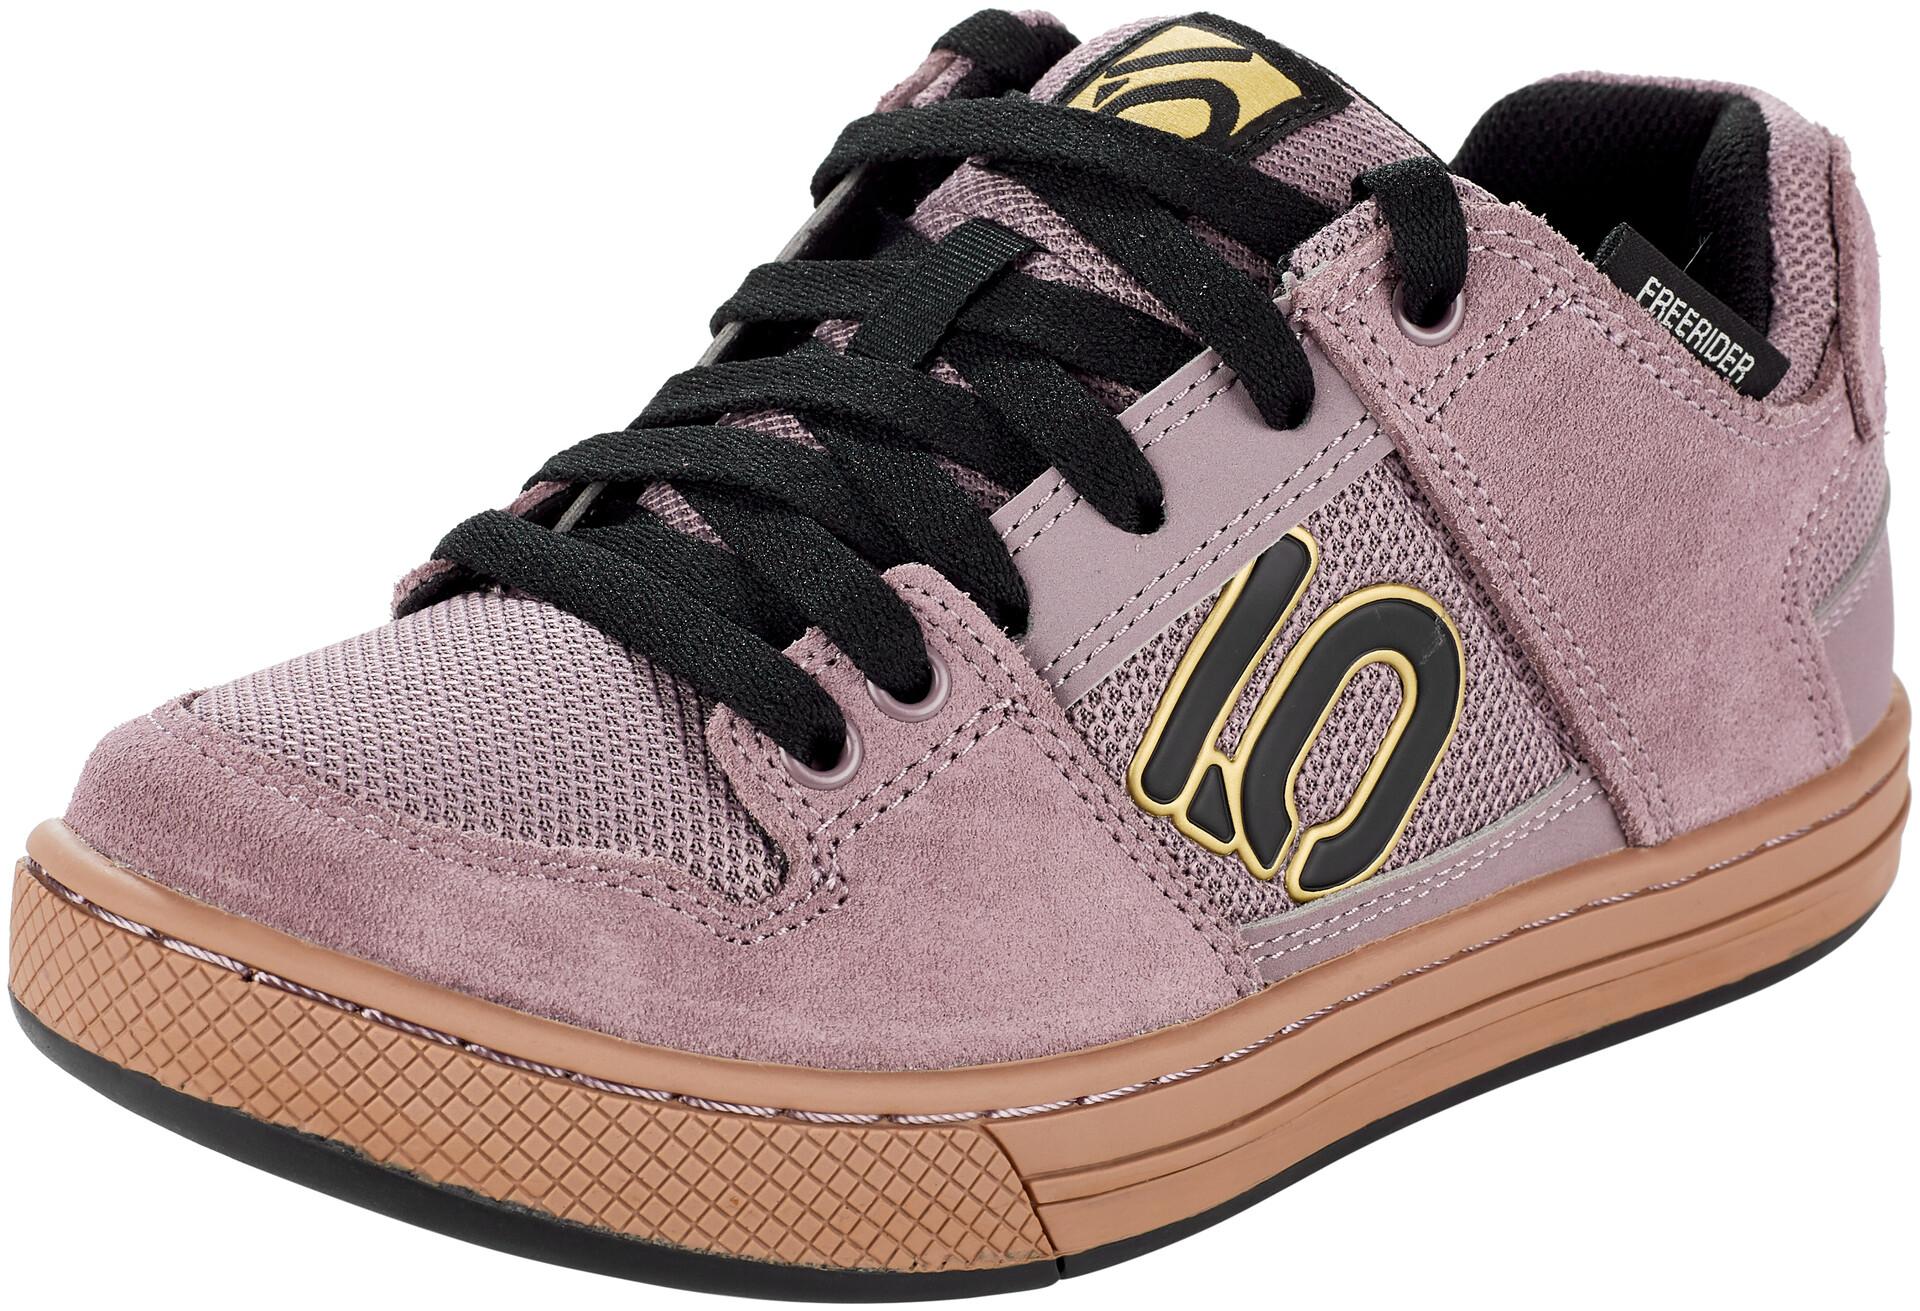 adidas Five Ten Freerider Cykelsko Damer, legacy purplecore blackgum M2